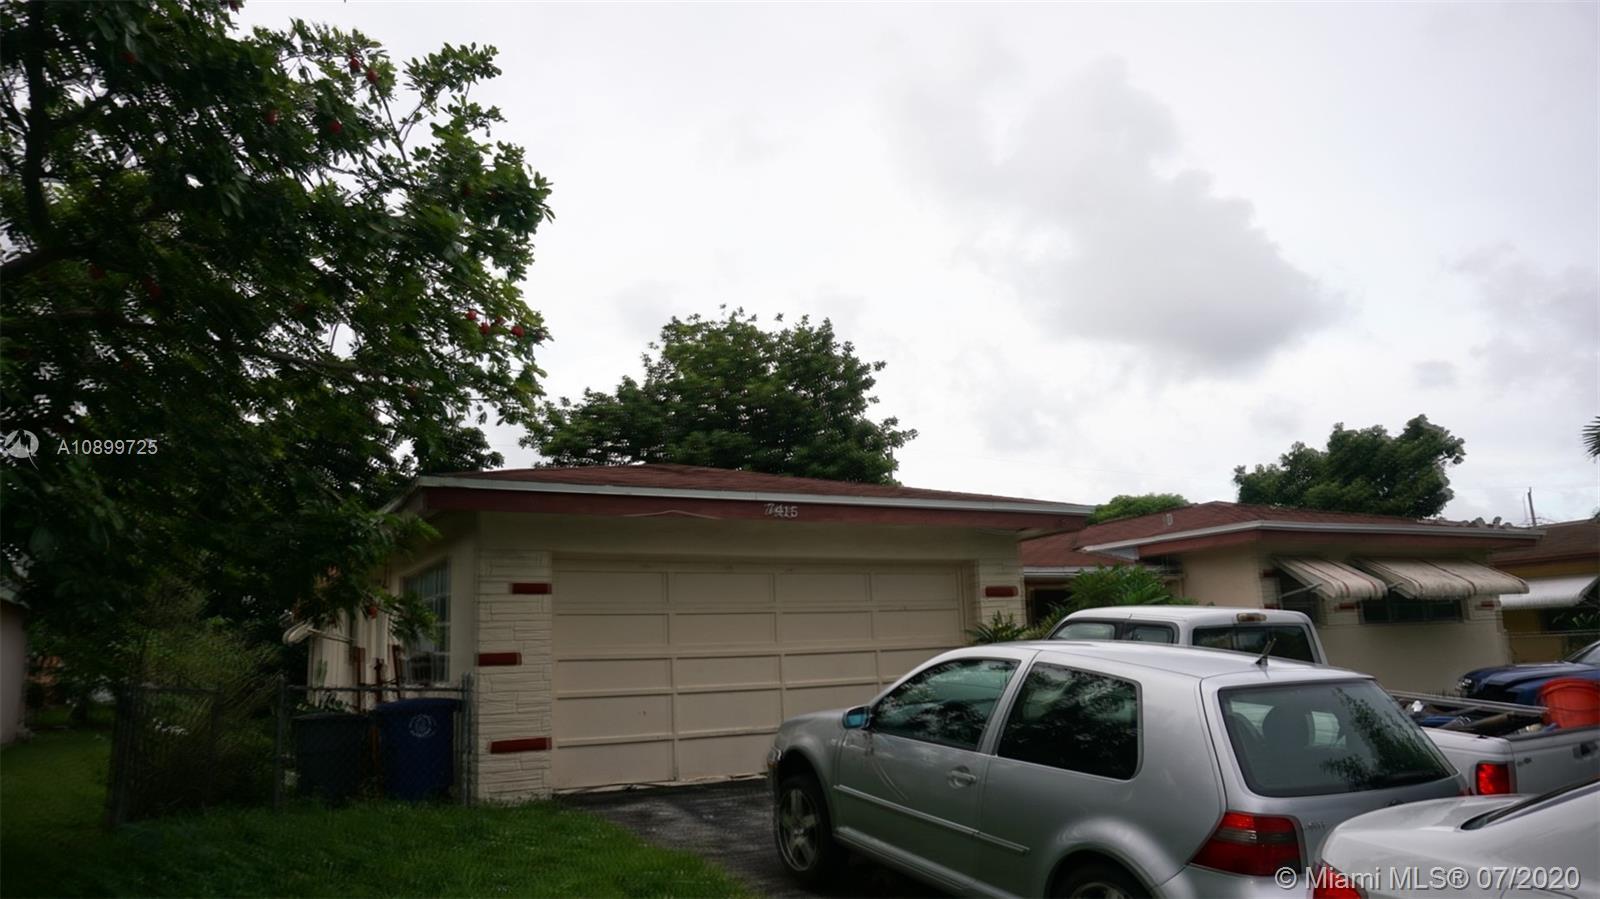 Miramar Sec - 7415 Panama St, Miramar, FL 33023